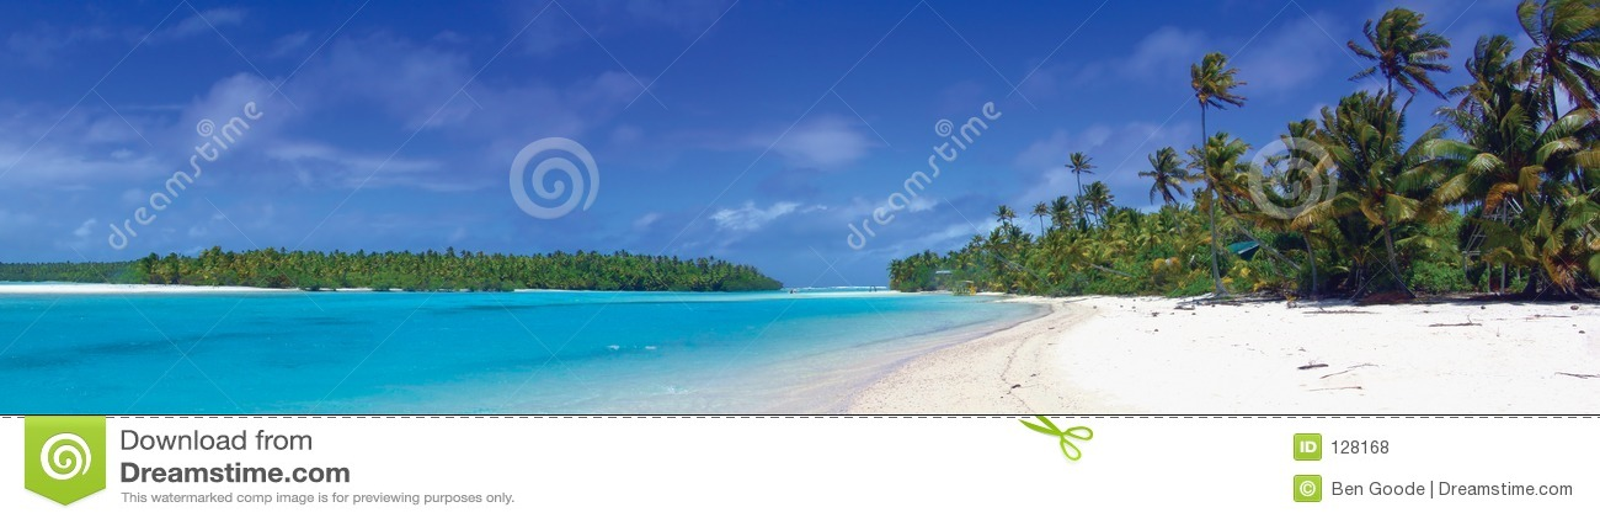 Panorama tropical